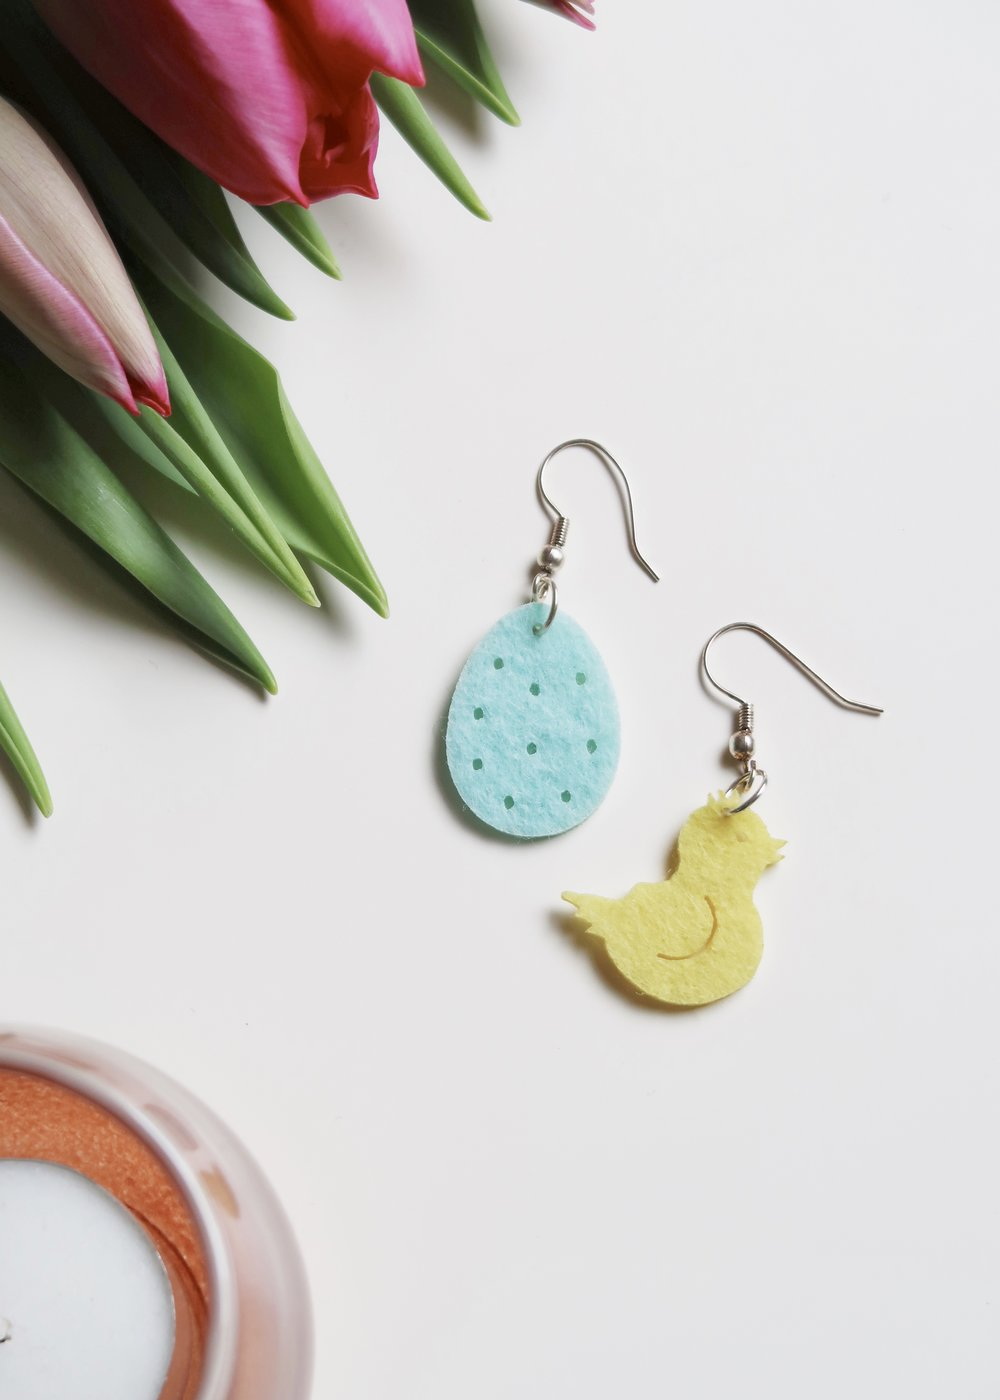 5 Minute DIY - Easter Confetti Earrings - Isoscella